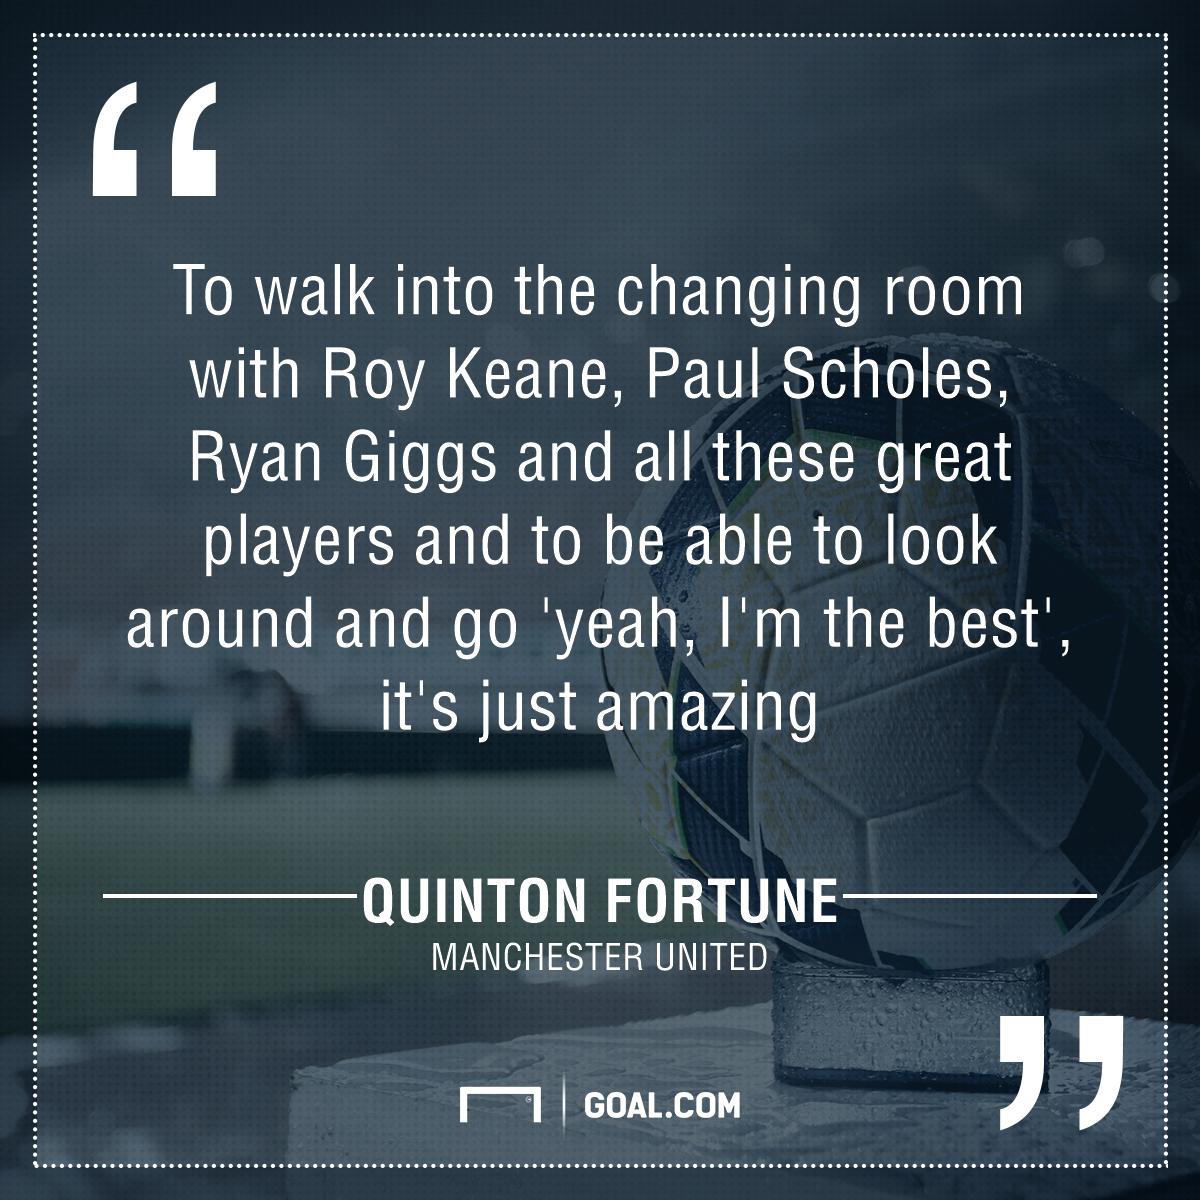 Fortune on Ronaldo PS